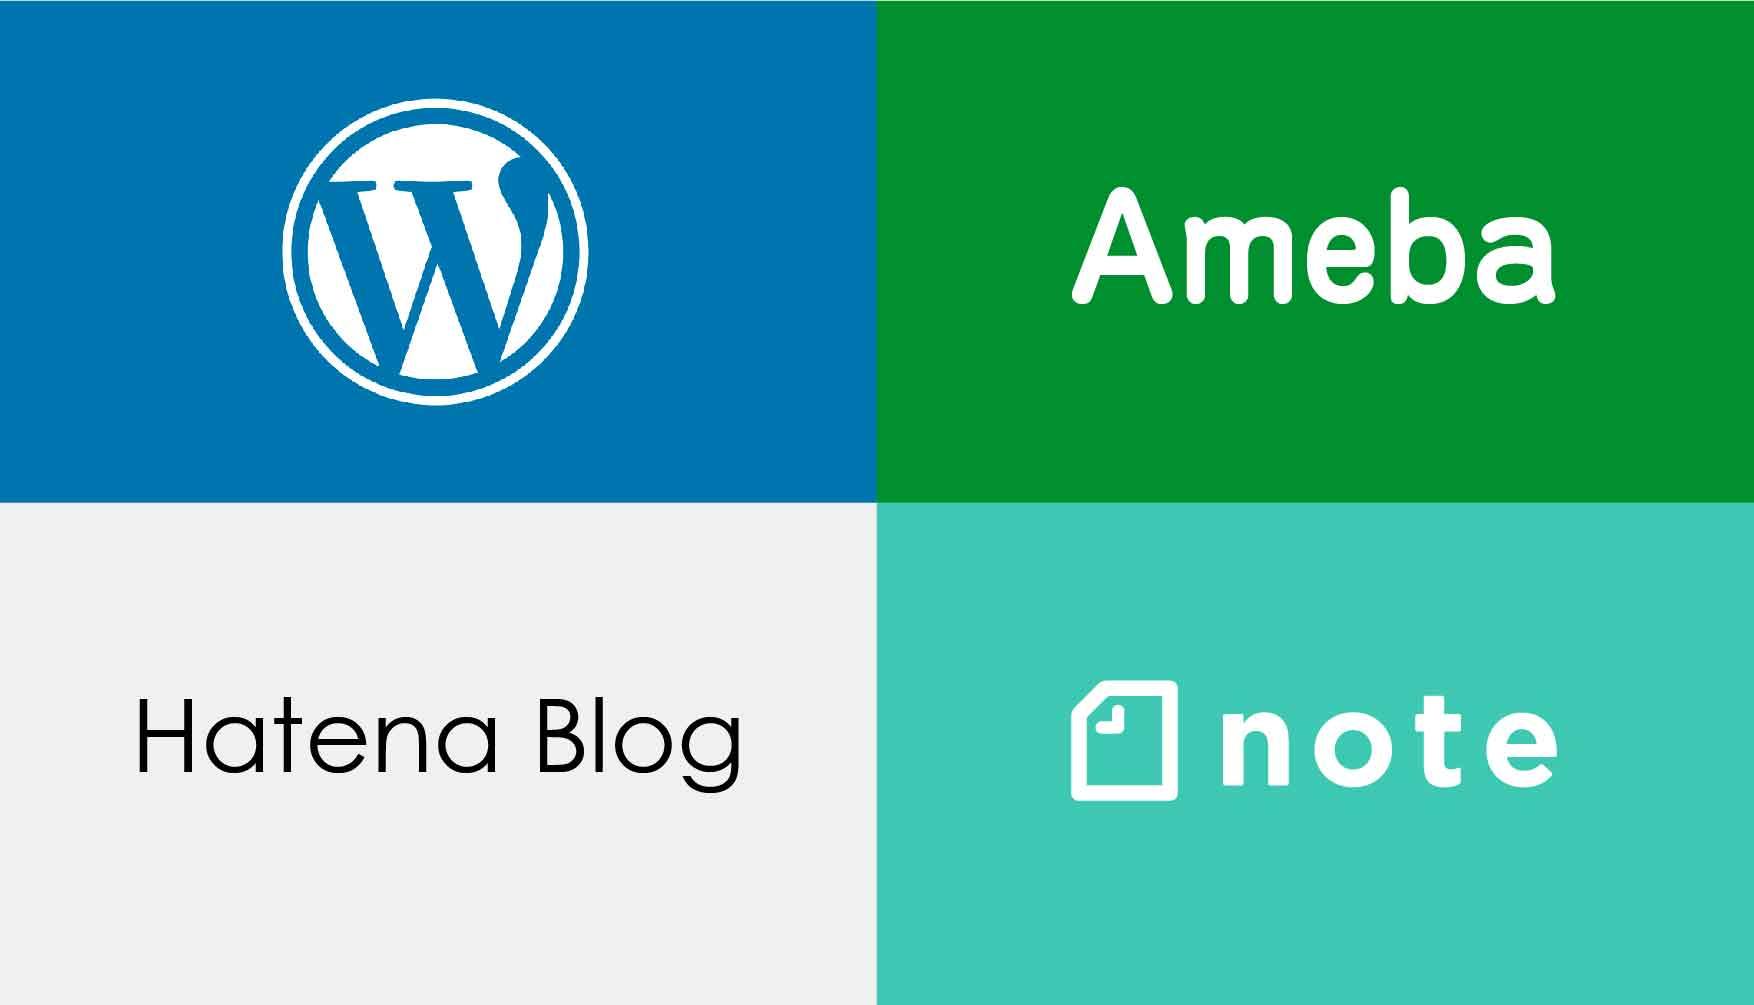 WordPressブログの始め方15